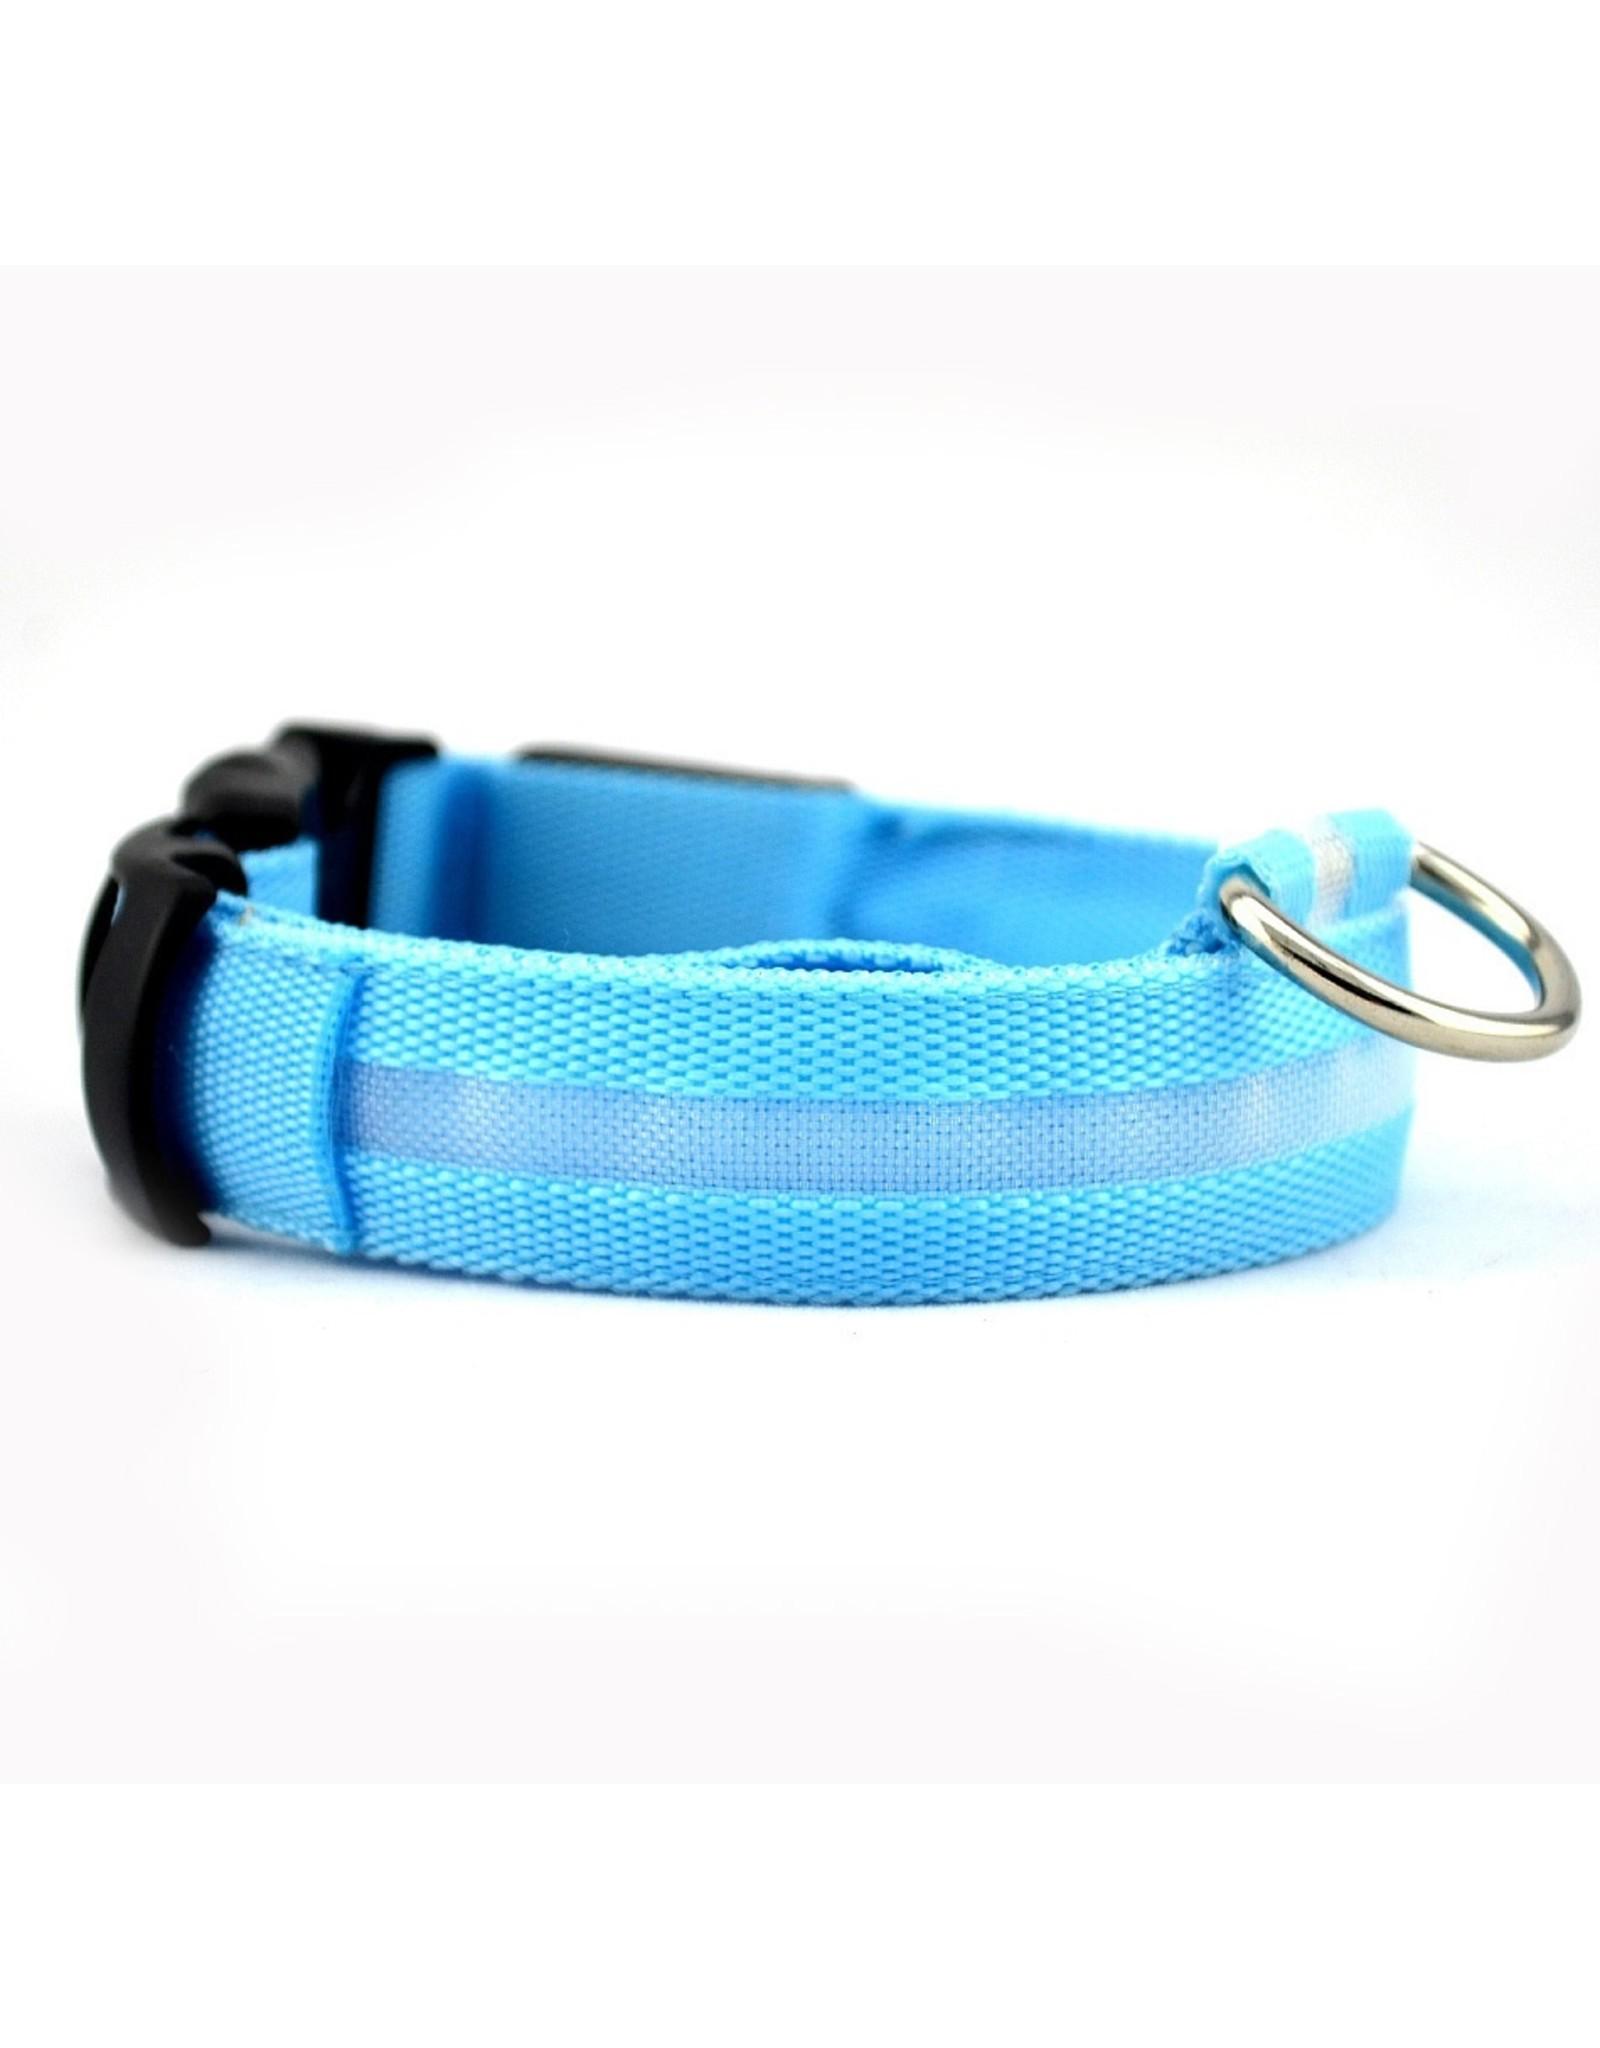 LED HALSBAND- STANDAARD BLAUW – Halsband voor uw hond – Halsband met verlichting